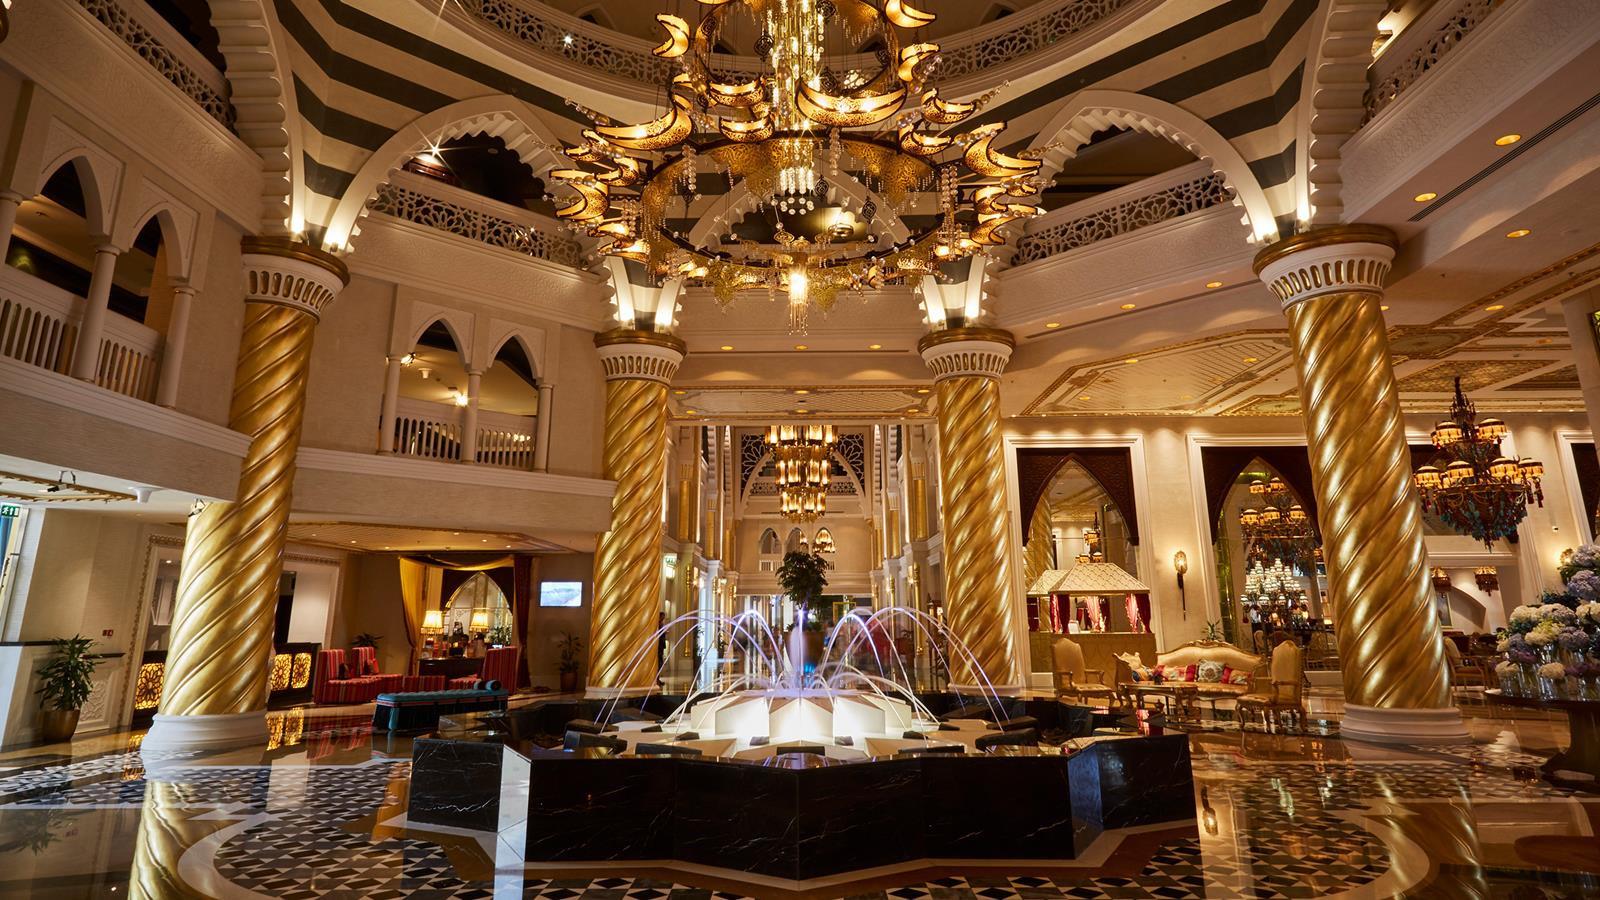 jumeirah-zabeel-saray-gallery-3.jpg